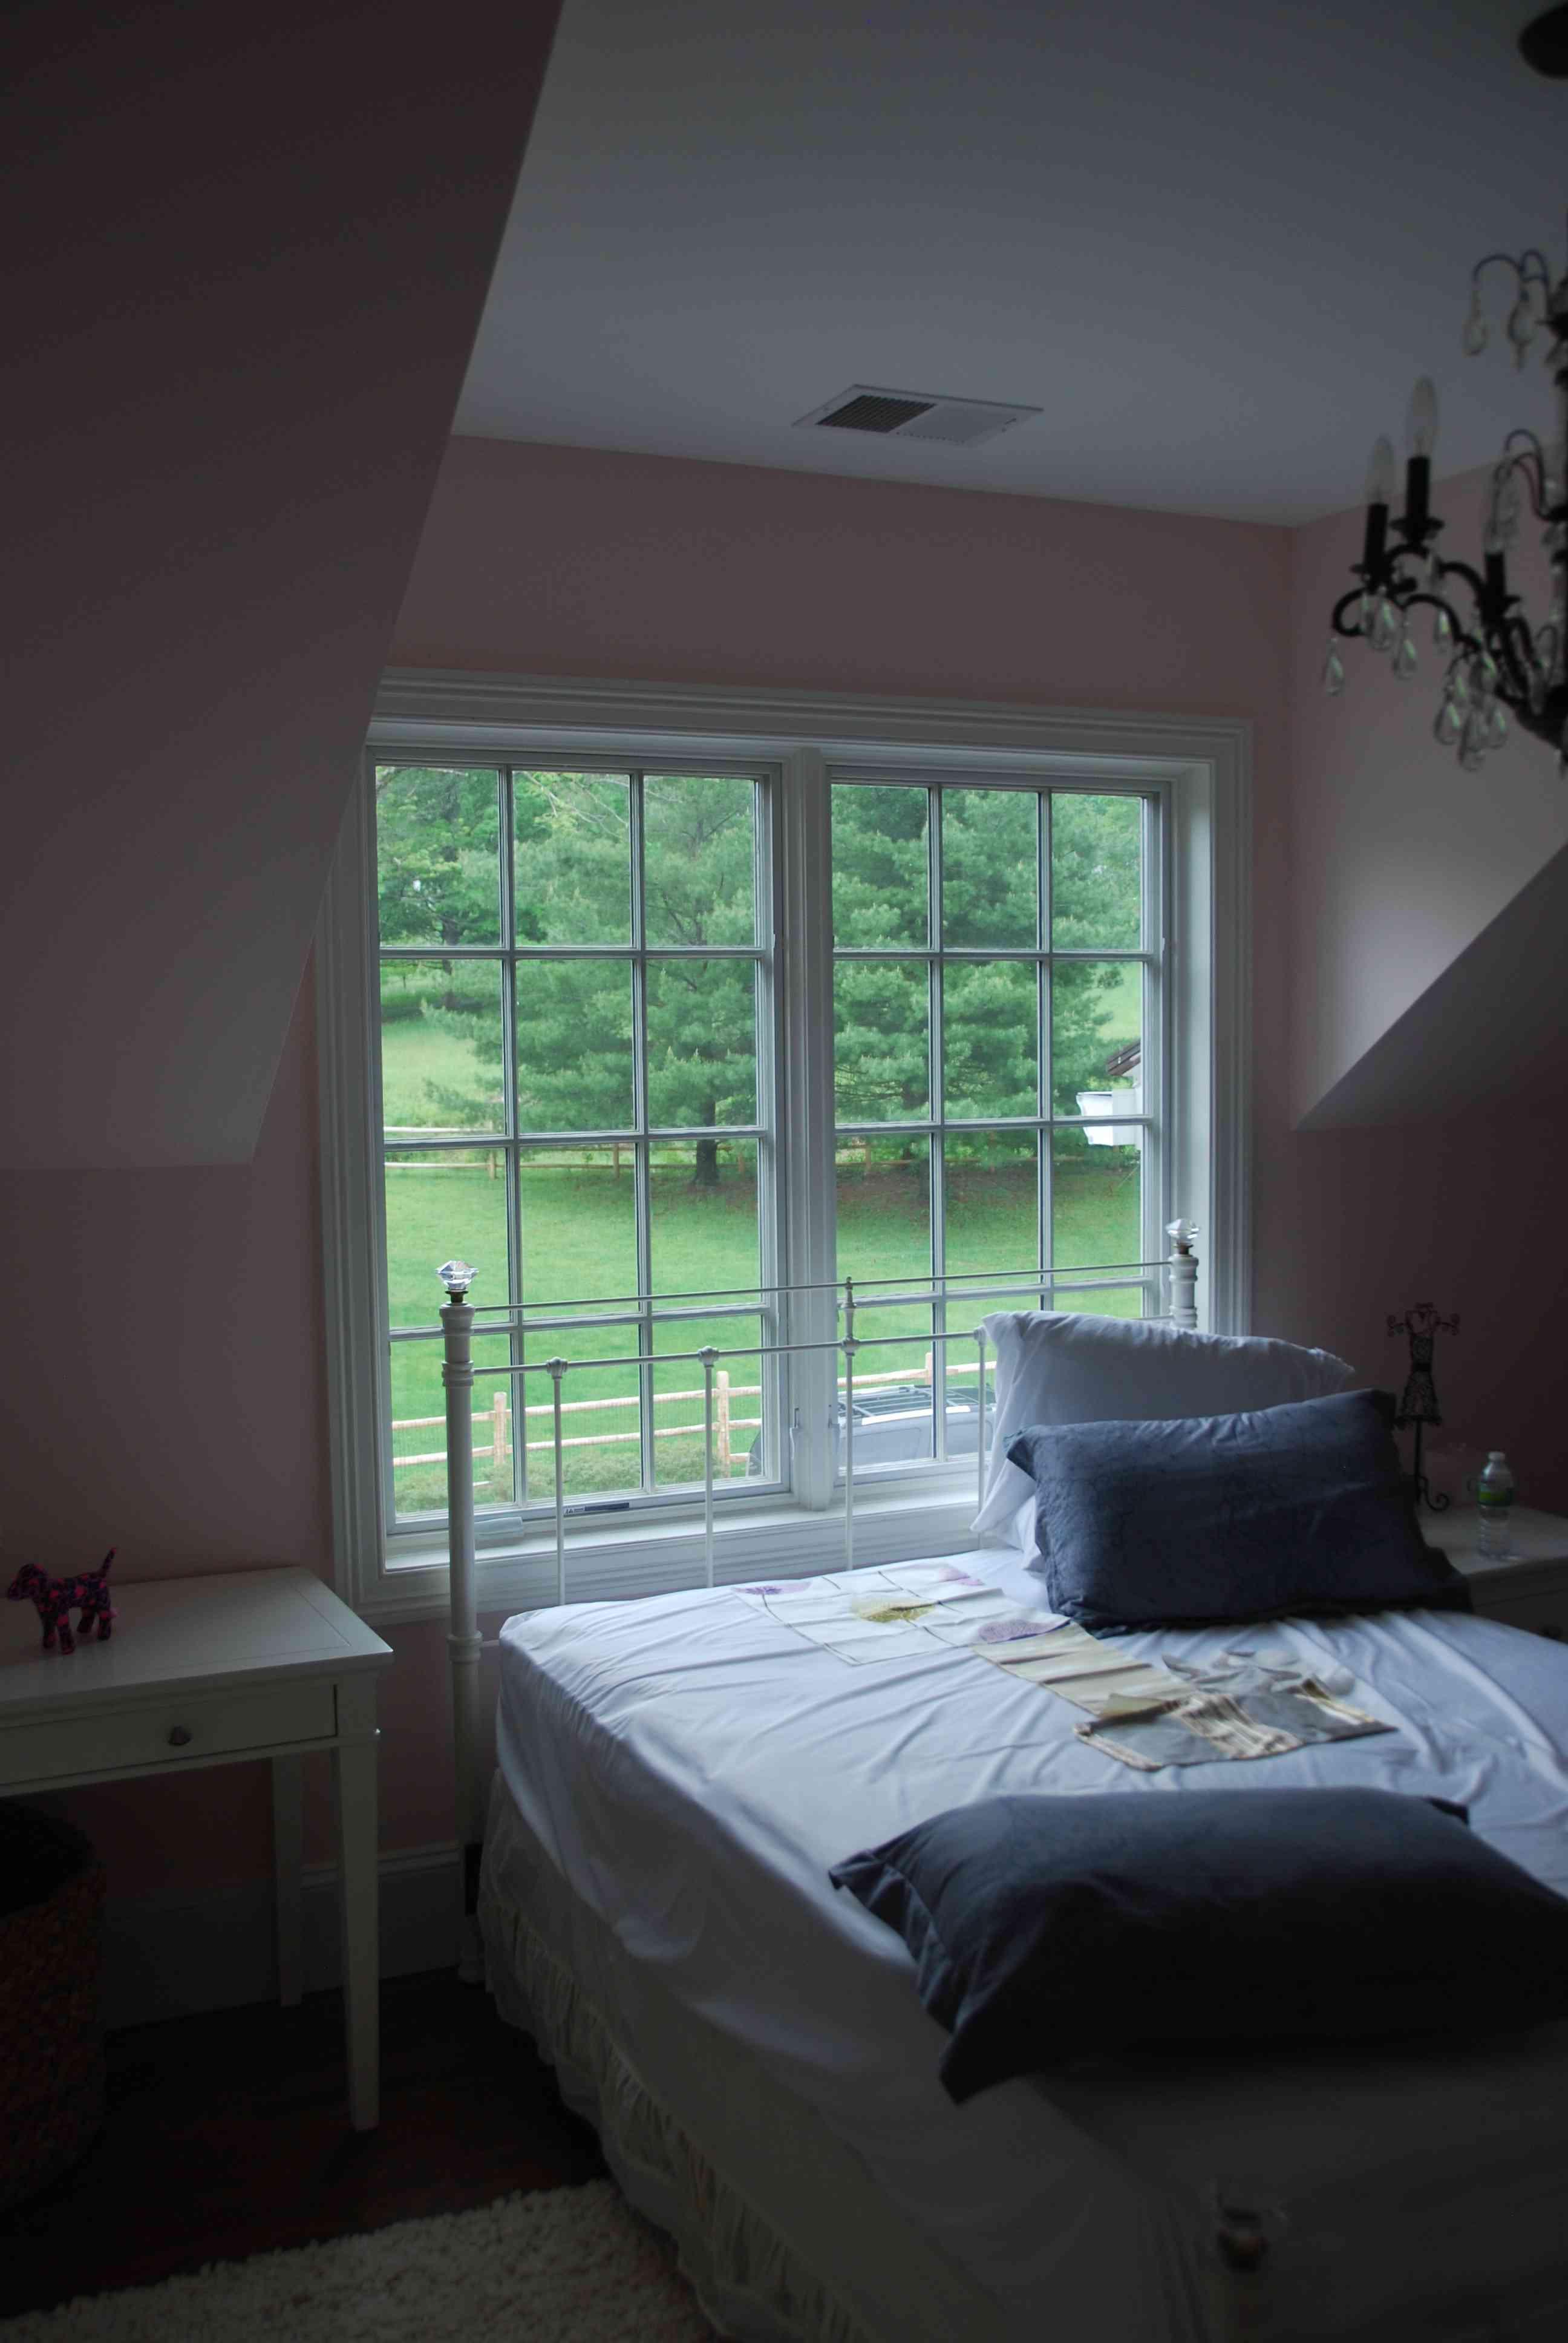 Dark and dull boy's bedroom.